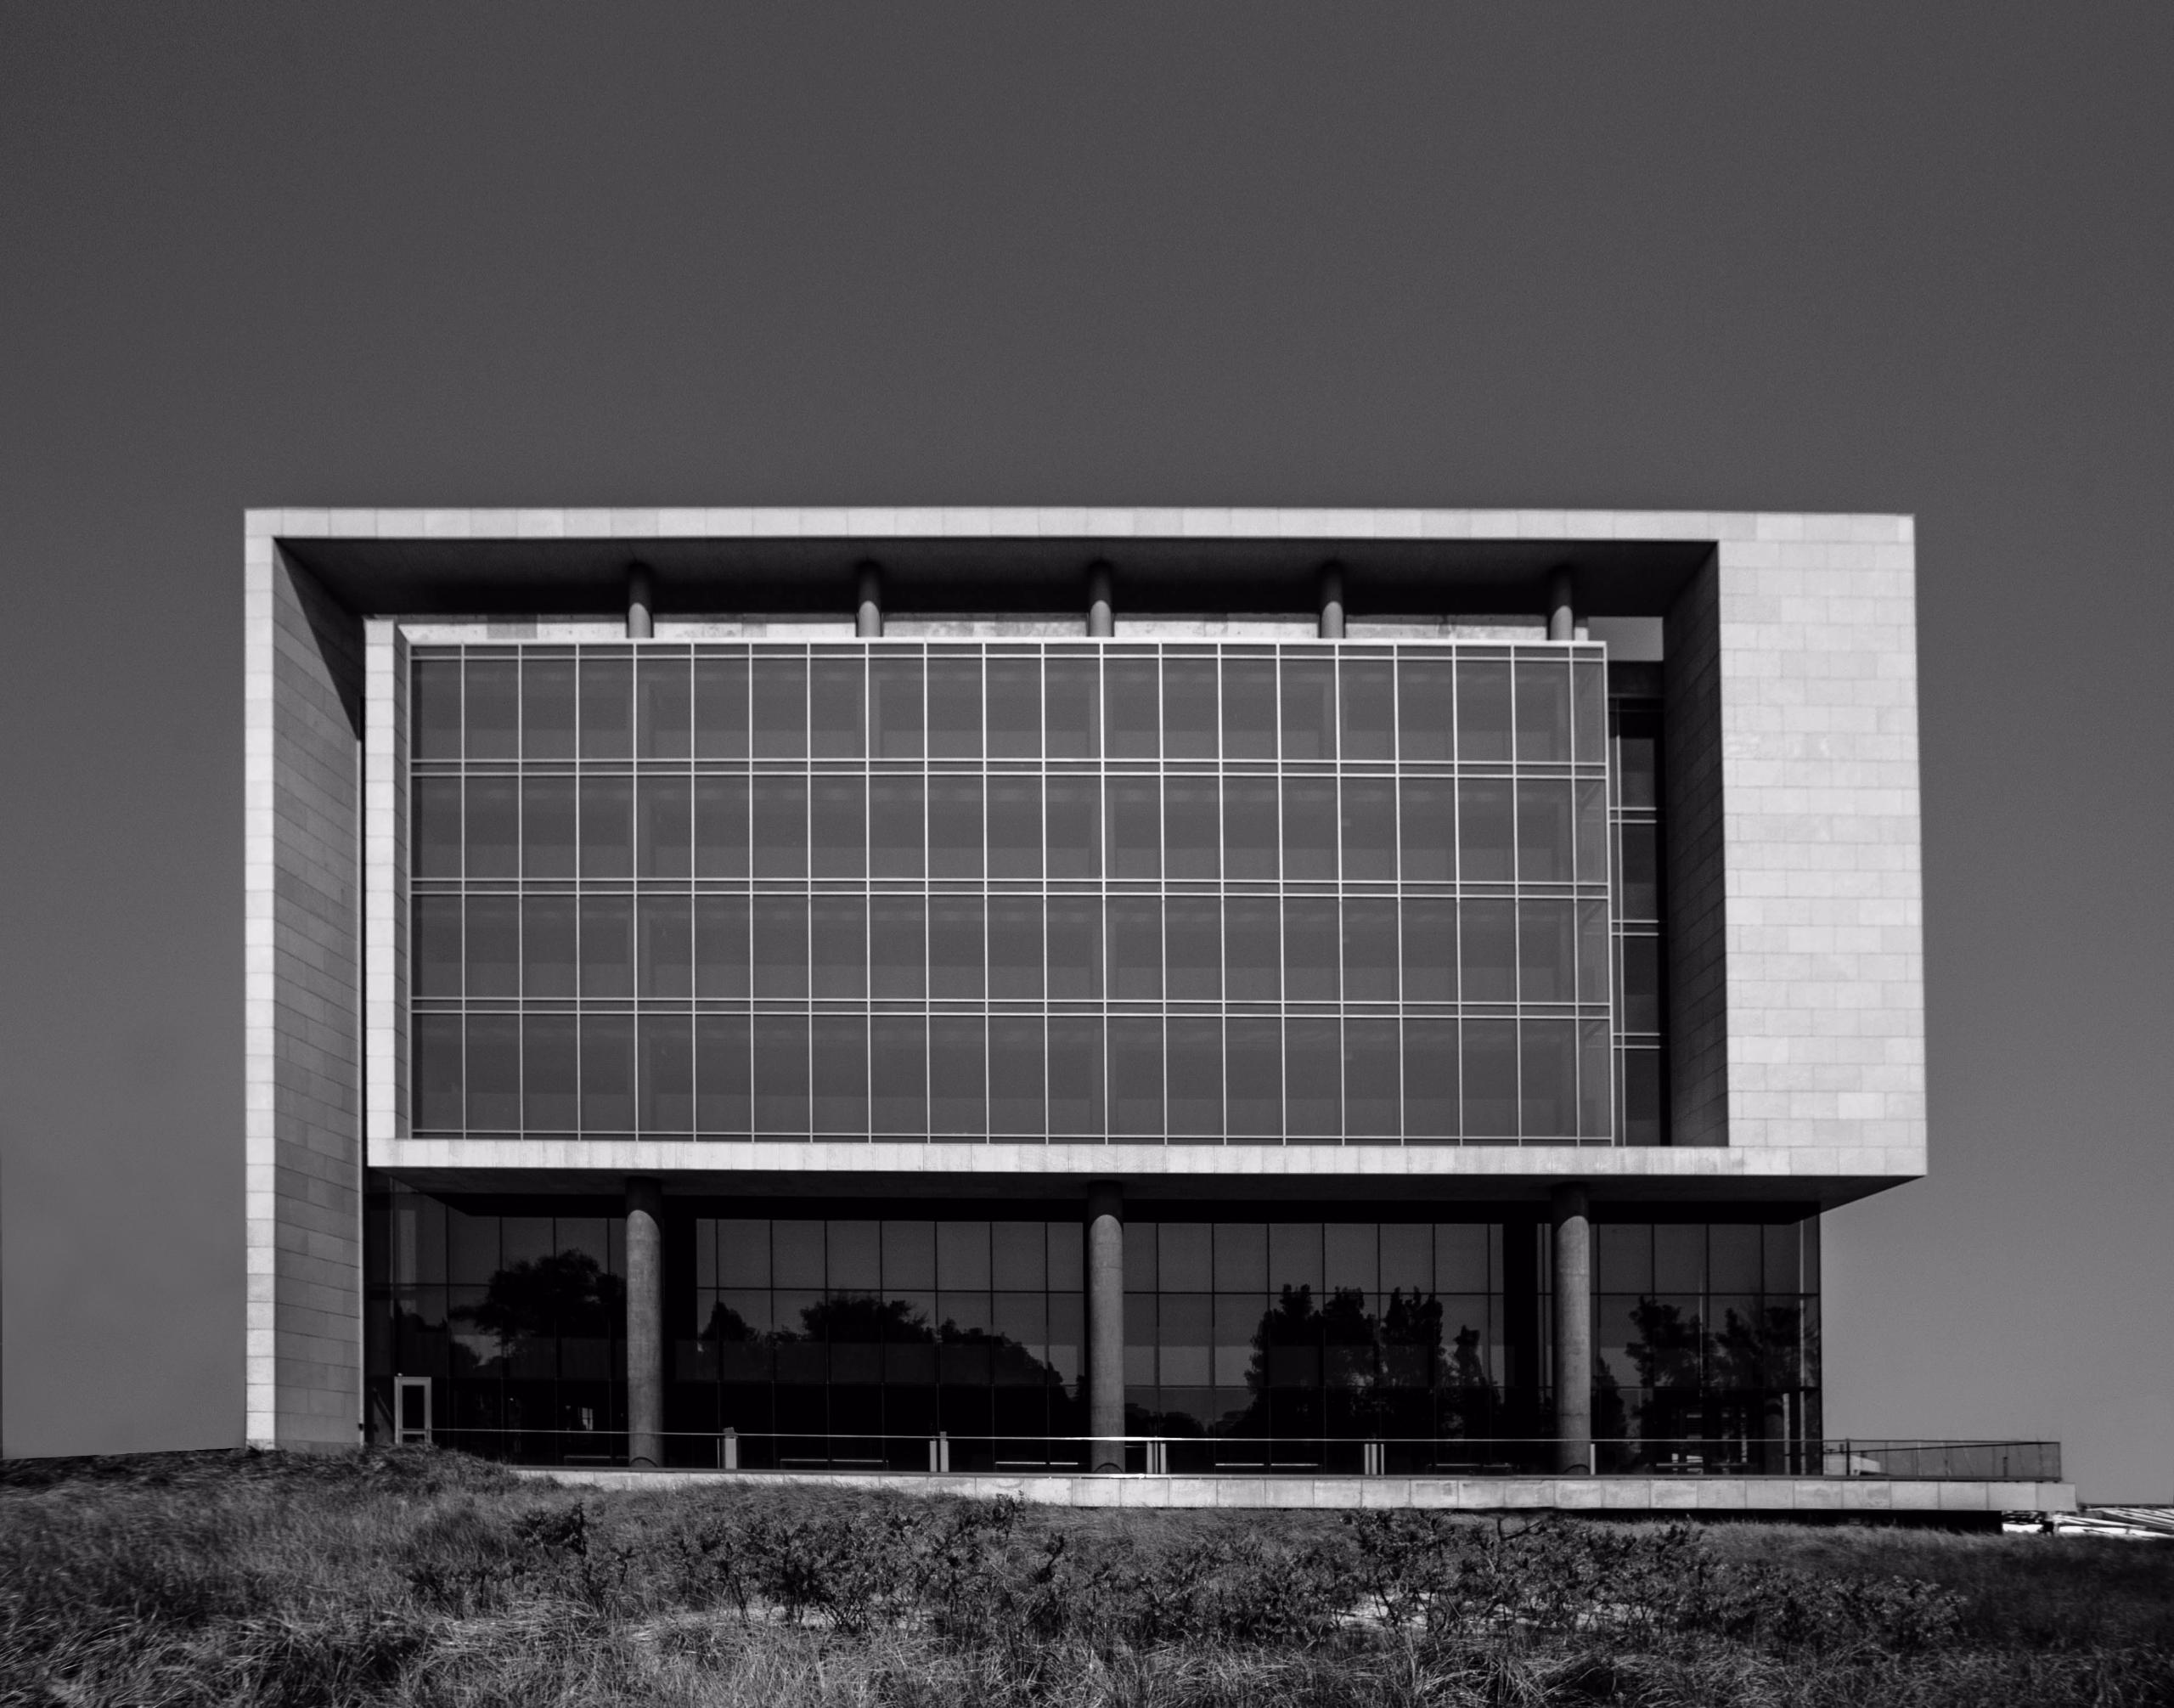 Segal Visitor Center Nr. 2 - No - junwin | ello